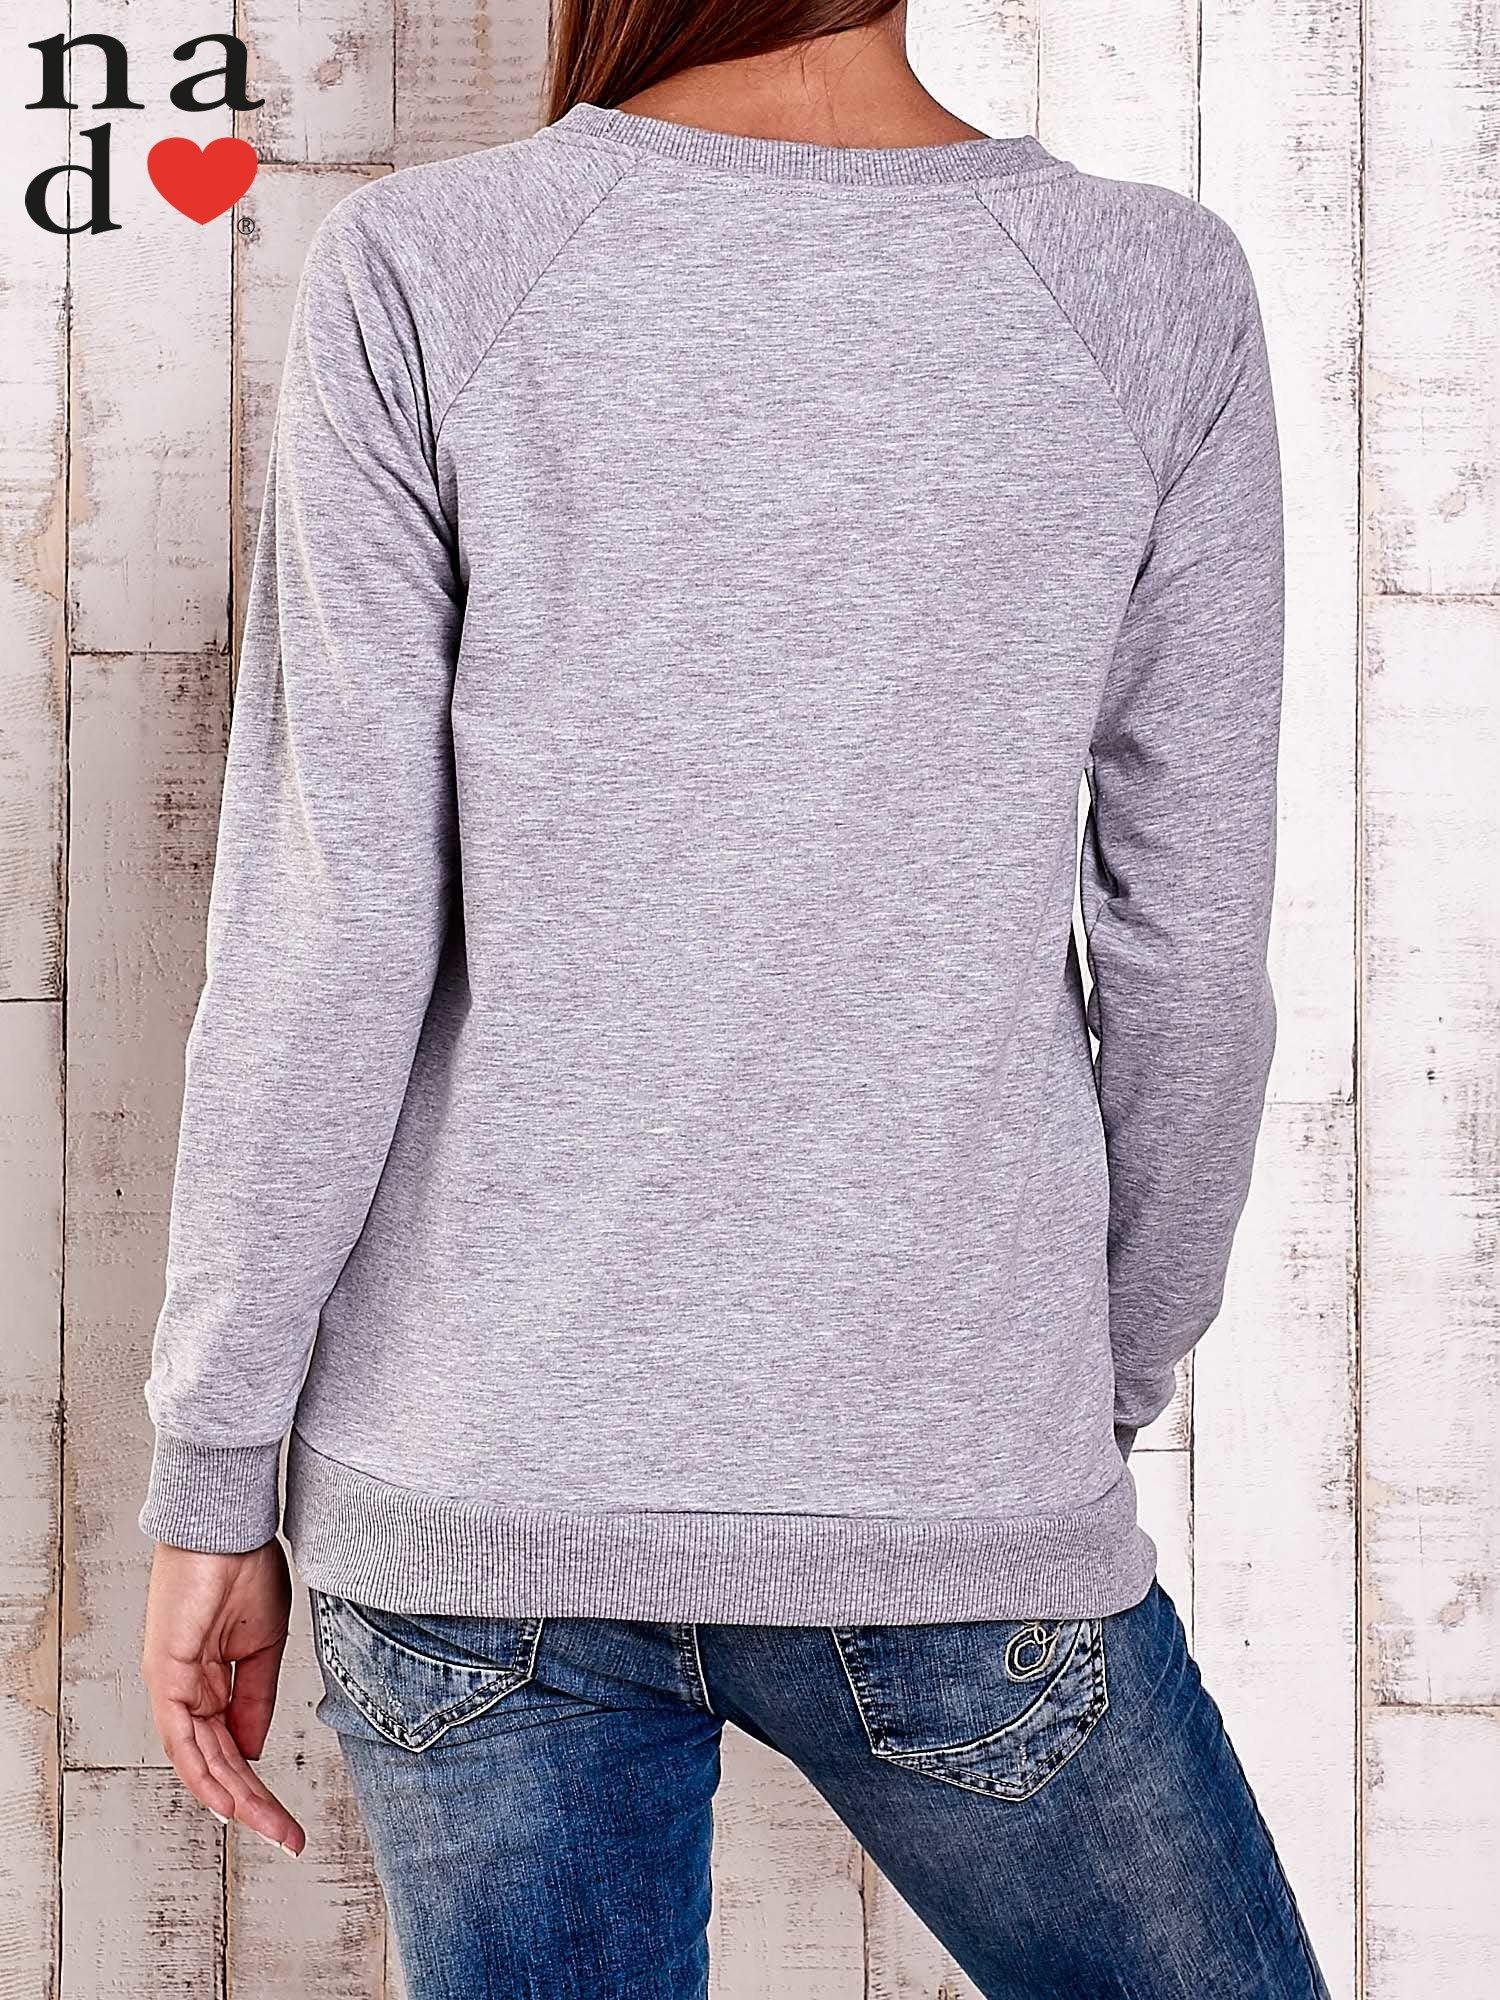 Szara bluza z nadrukiem serca i napisem JE T'AIME                                   zdj.                                  2